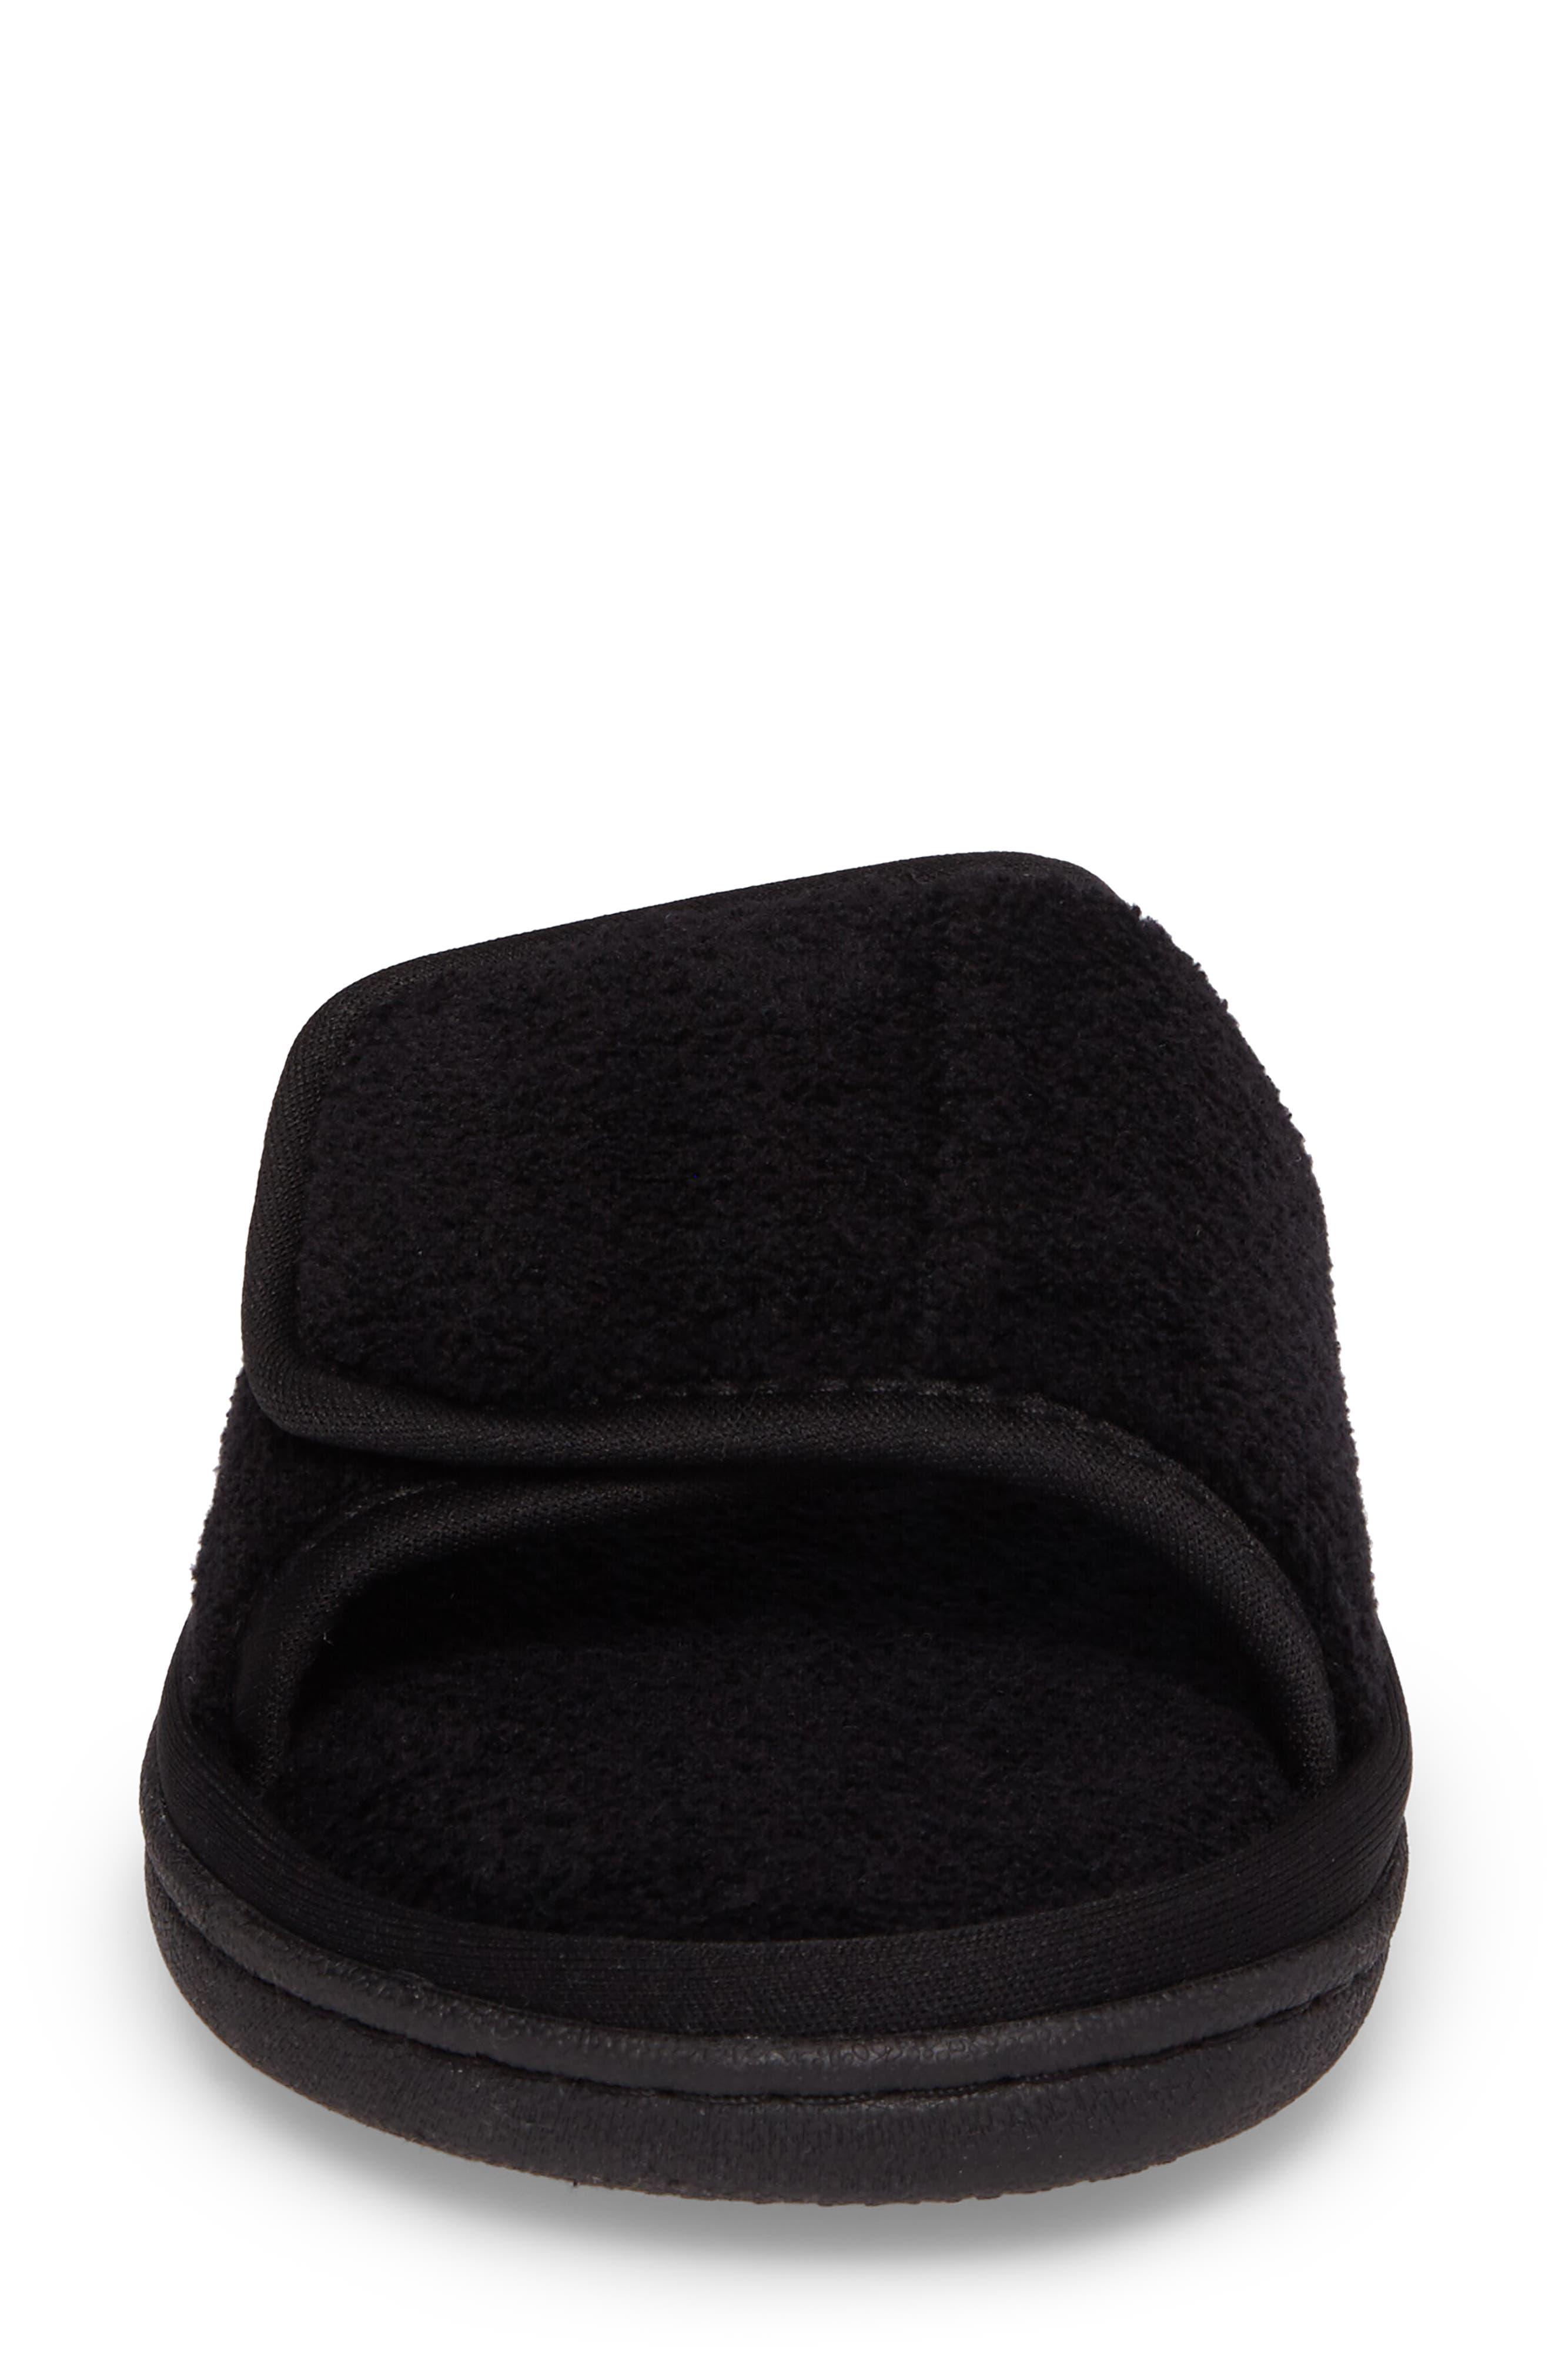 Geana Slipper,                             Alternate thumbnail 4, color,                             Black Fabric